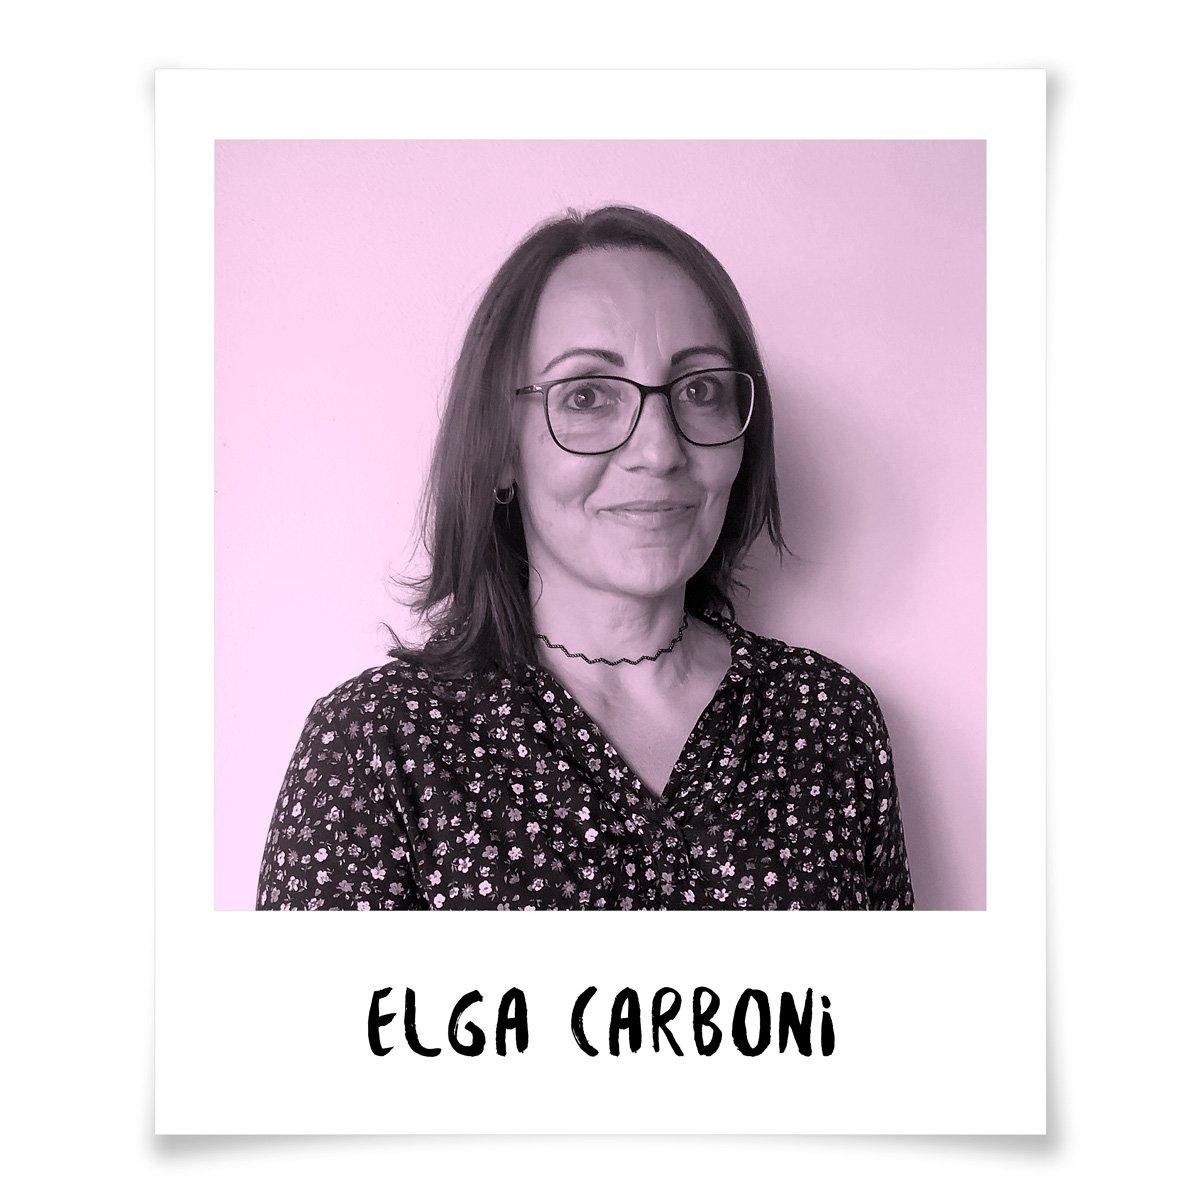 Elga_Carboni_ok